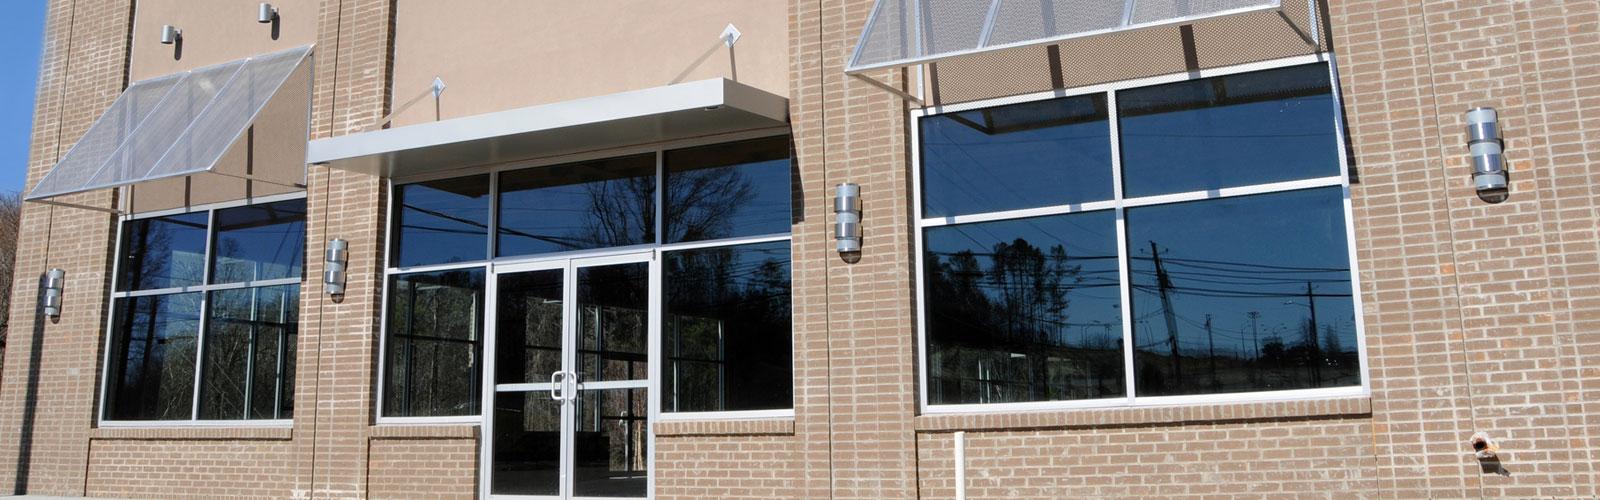 Decorating commercial door glass replacement pictures : NJ Commercial Glass & Storefront Doors | Dubin Glass